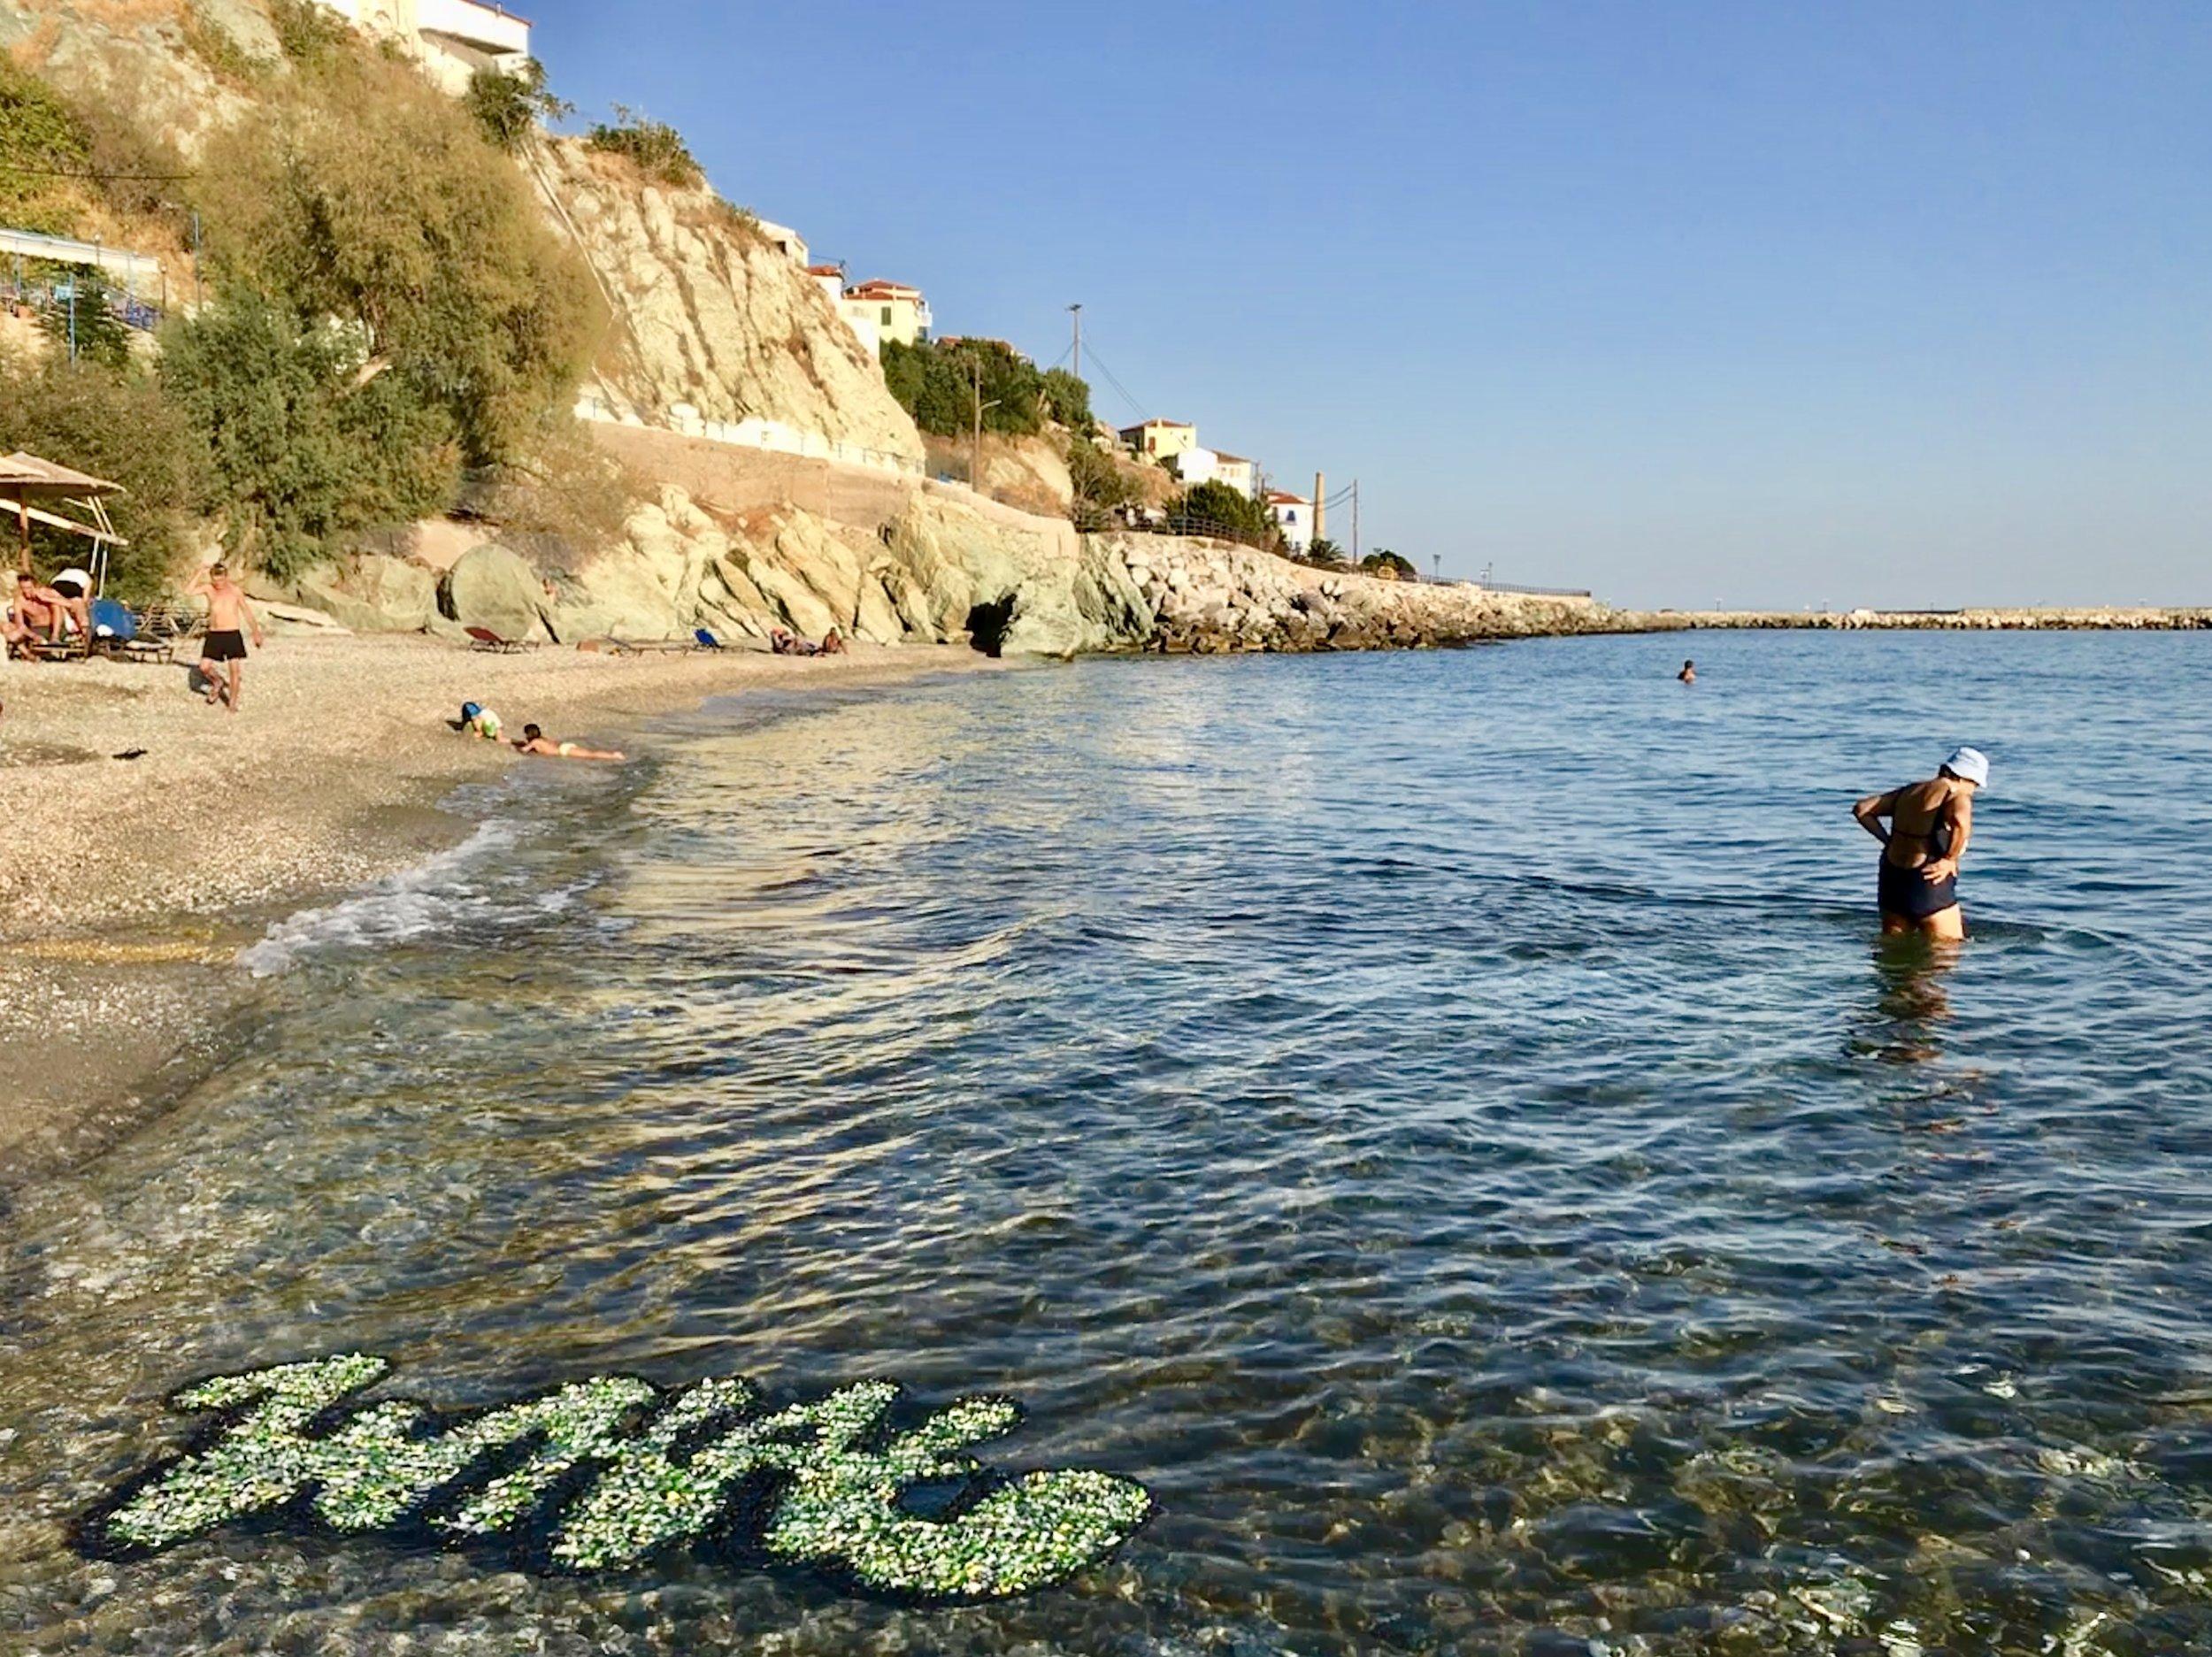 YARNOMANIAC in Lesbos #WHATaboutplastic